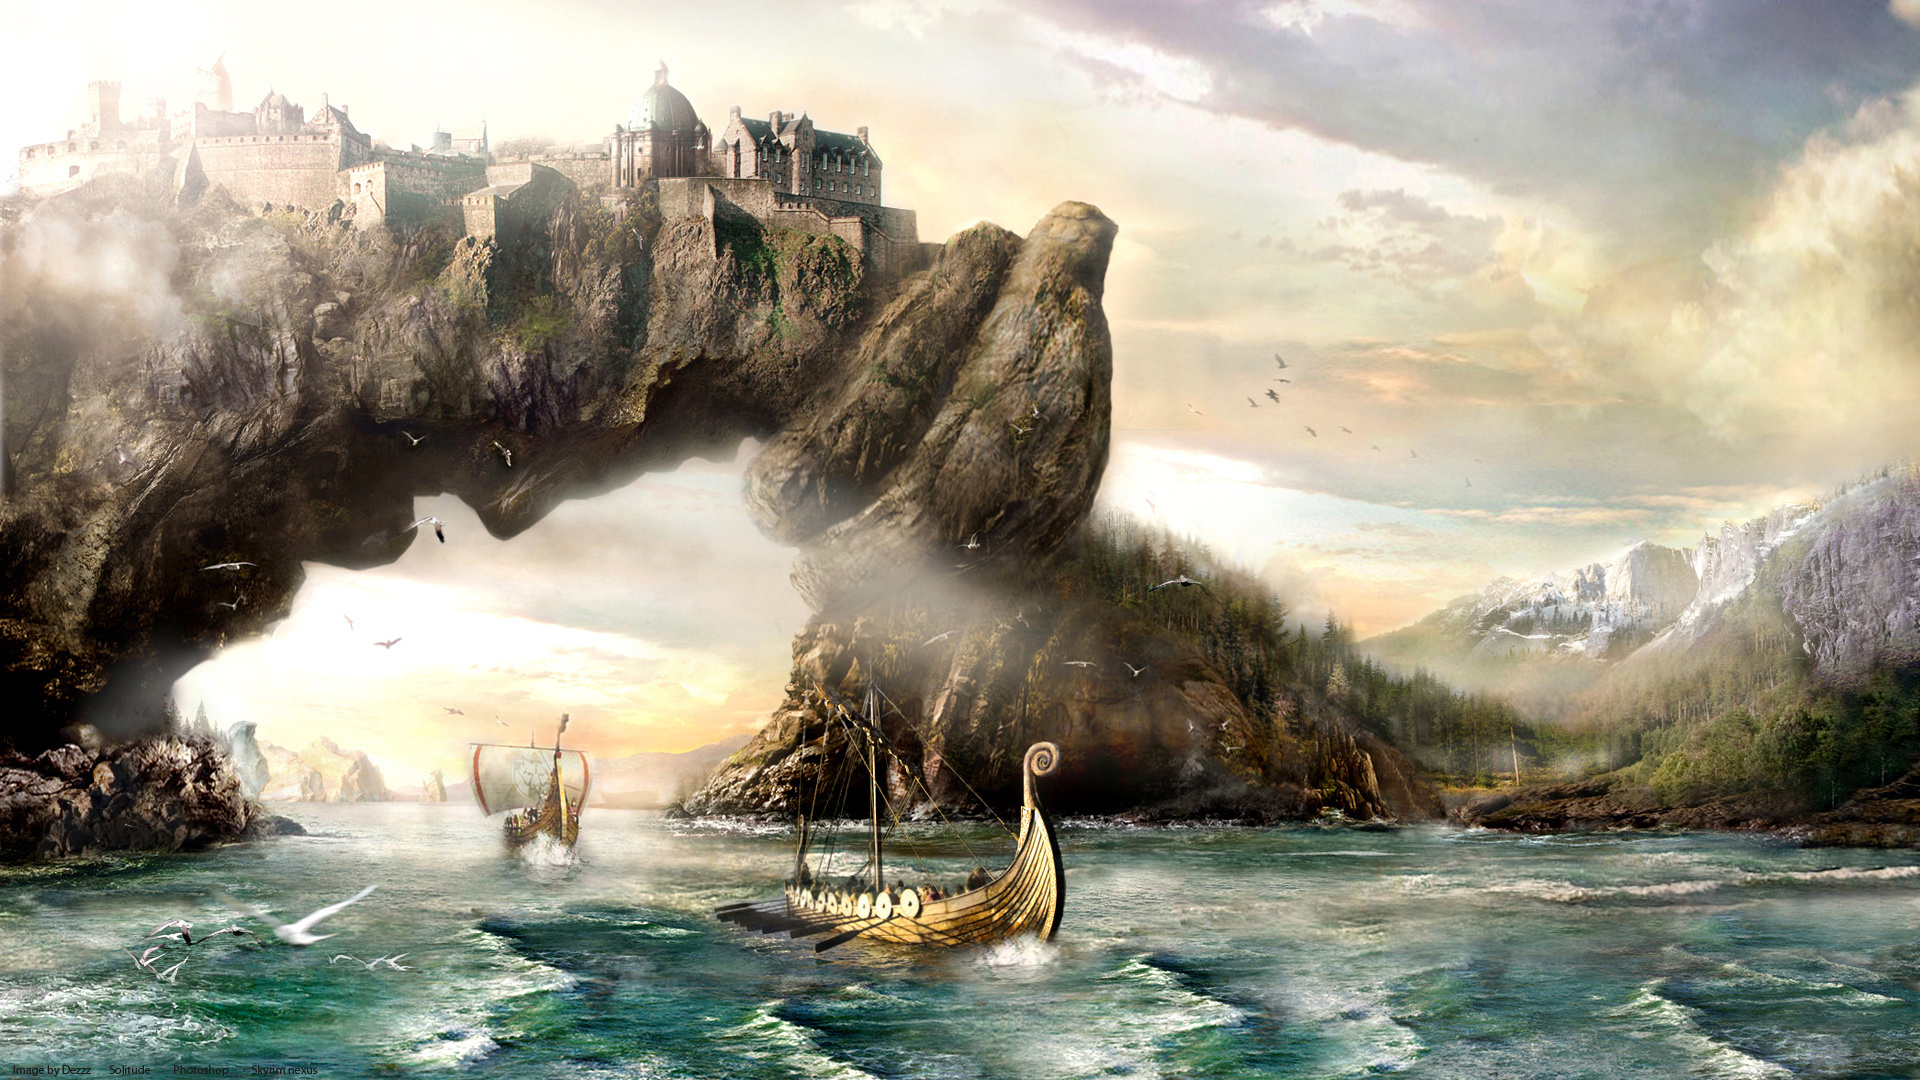 vikings sailing boats ships landscapes paintings mountains wallpaper 1920x1080